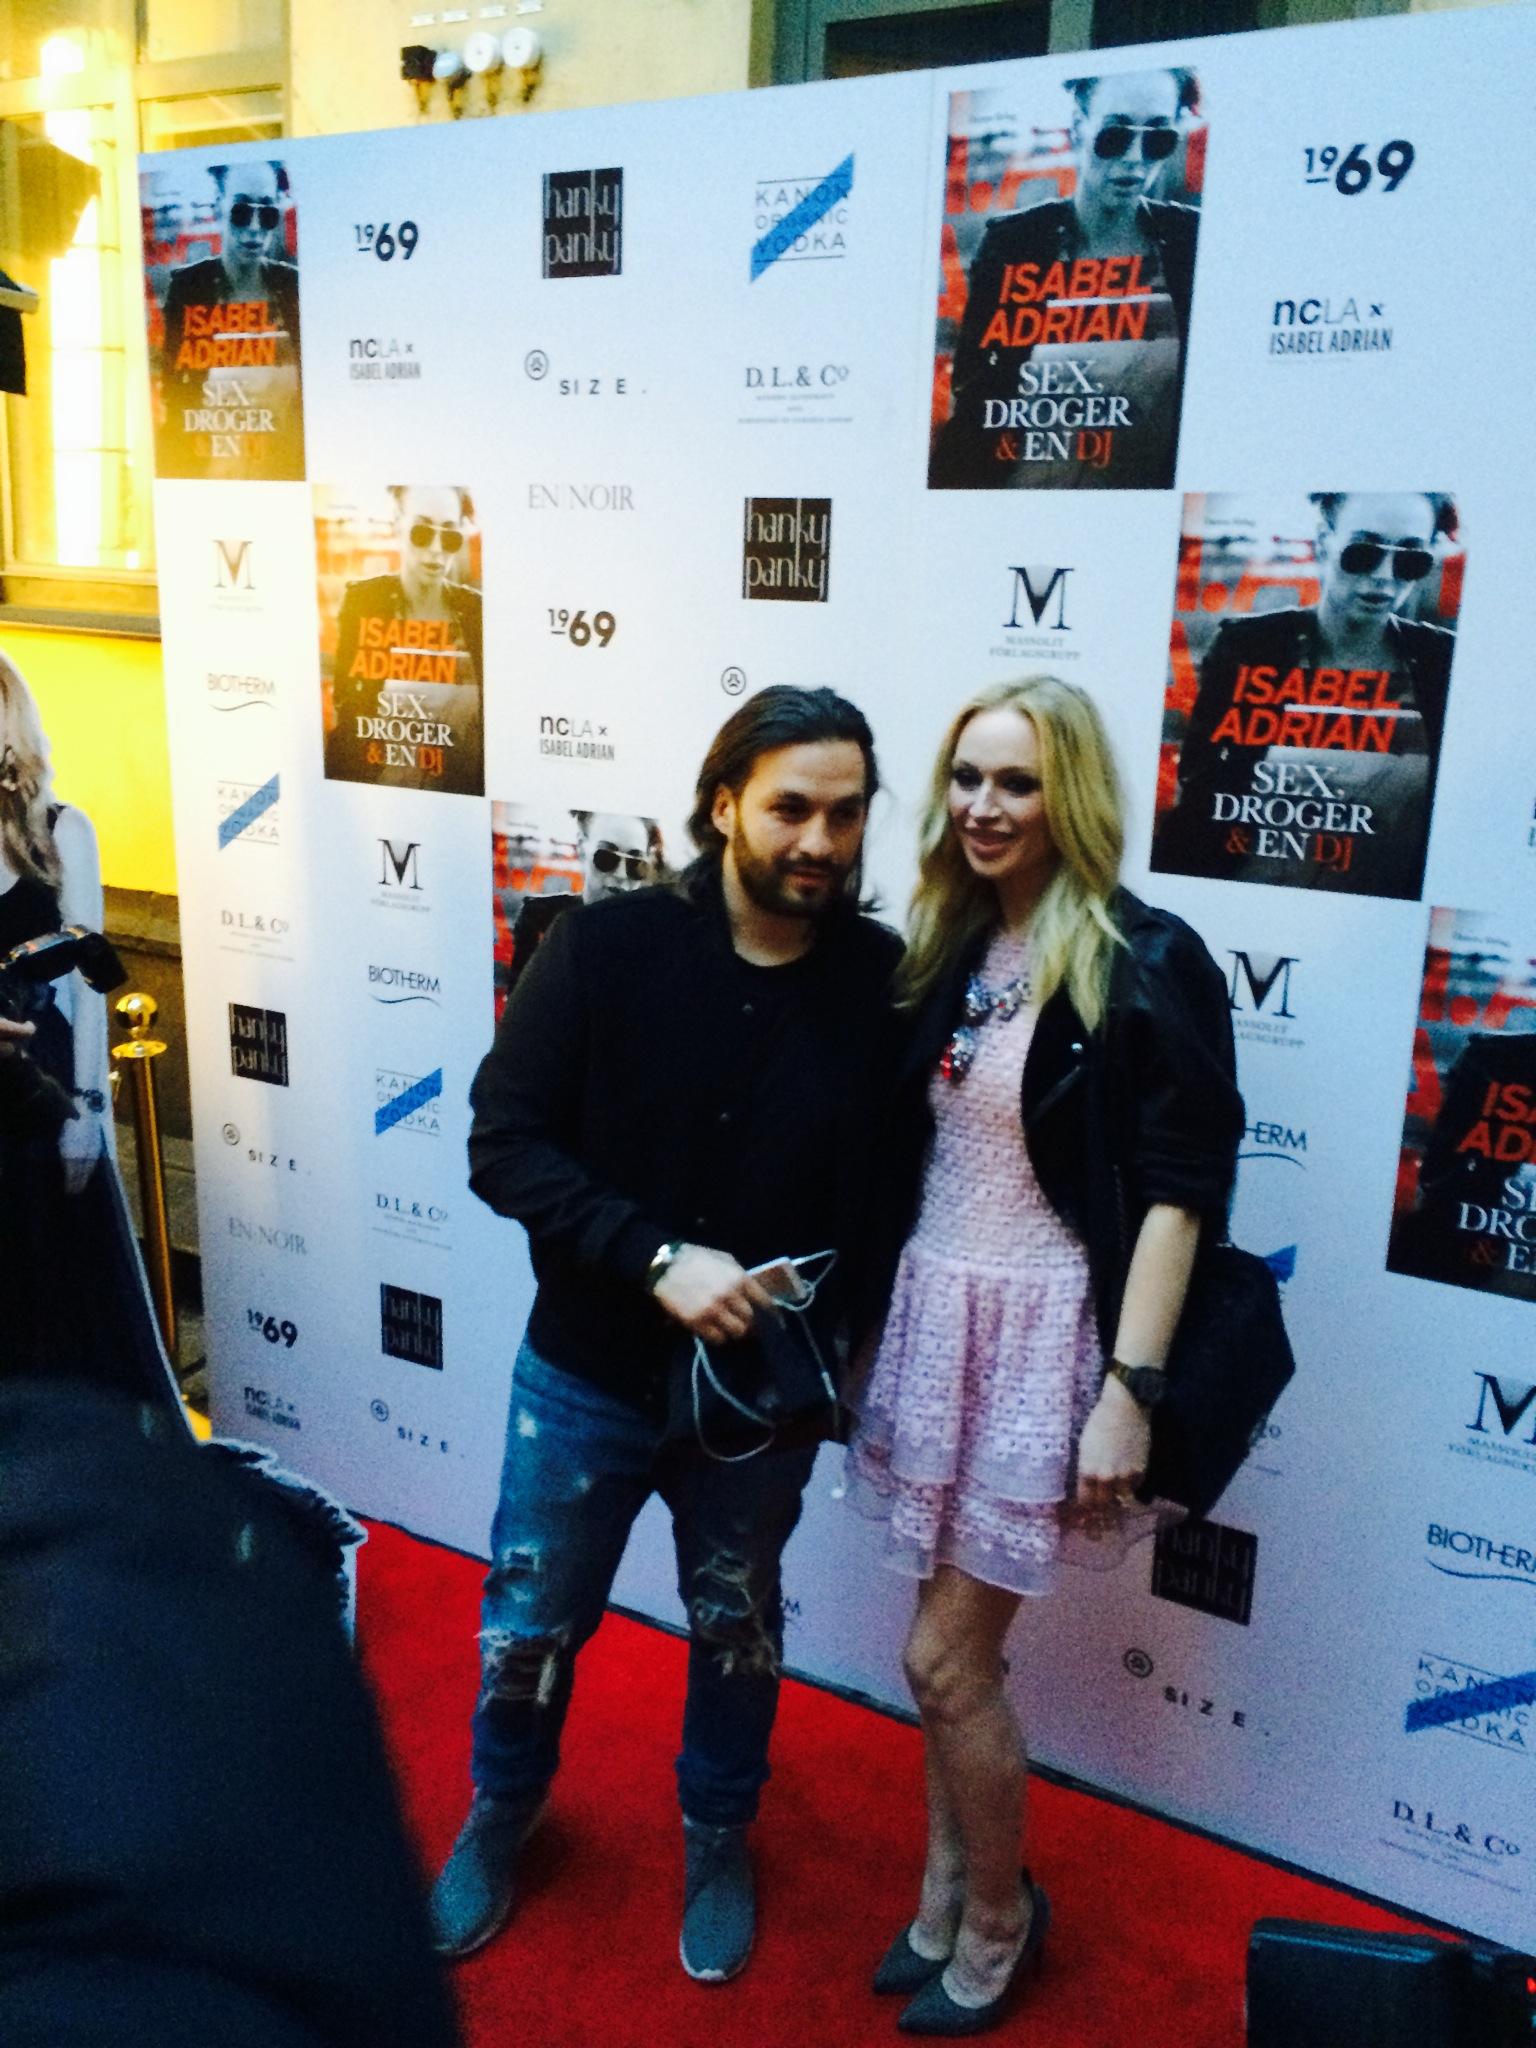 Isabel Adrian med sin man Steve Angelo